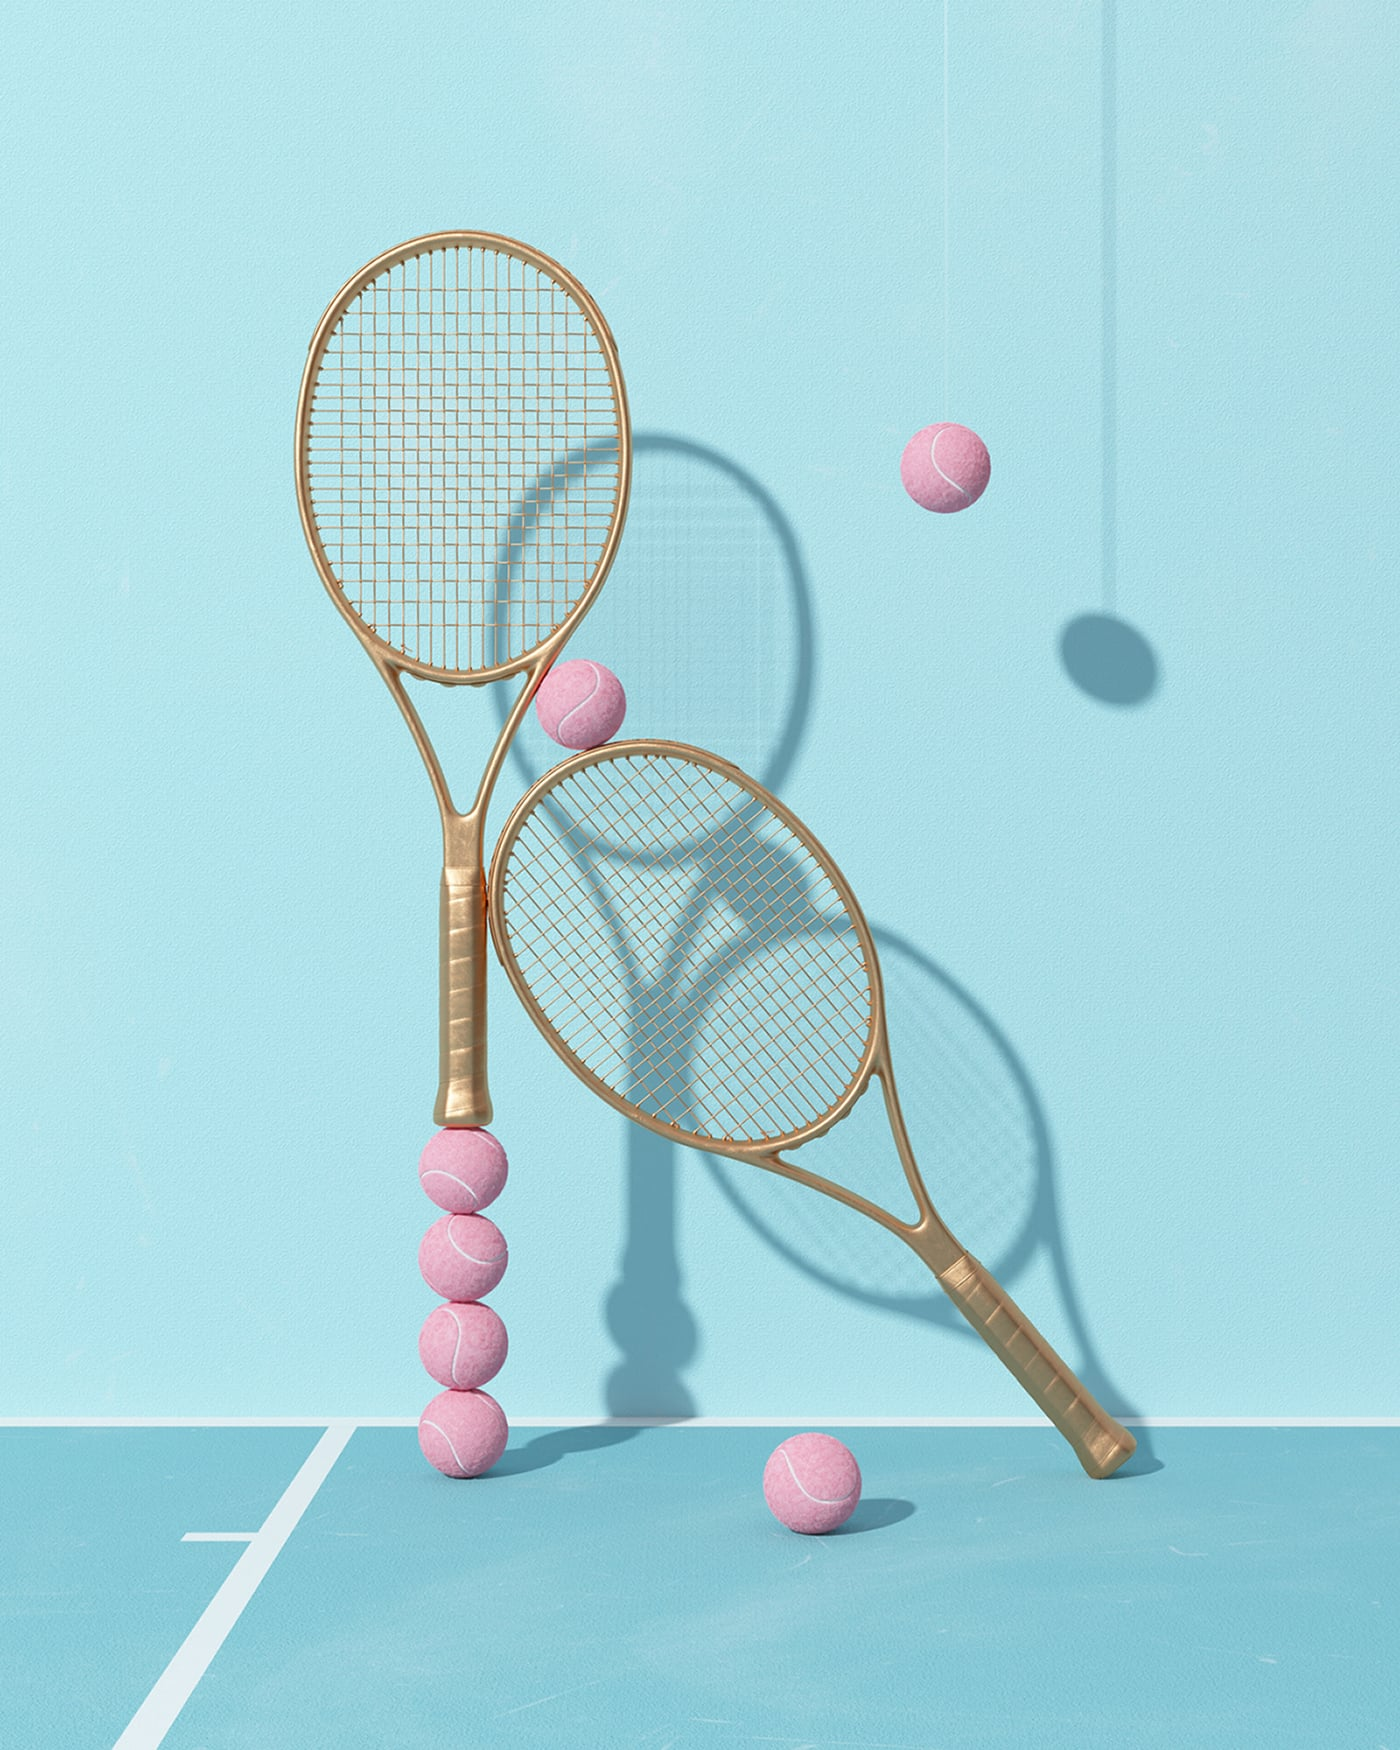 Tennis Arty Photography Mindsparkle Mag